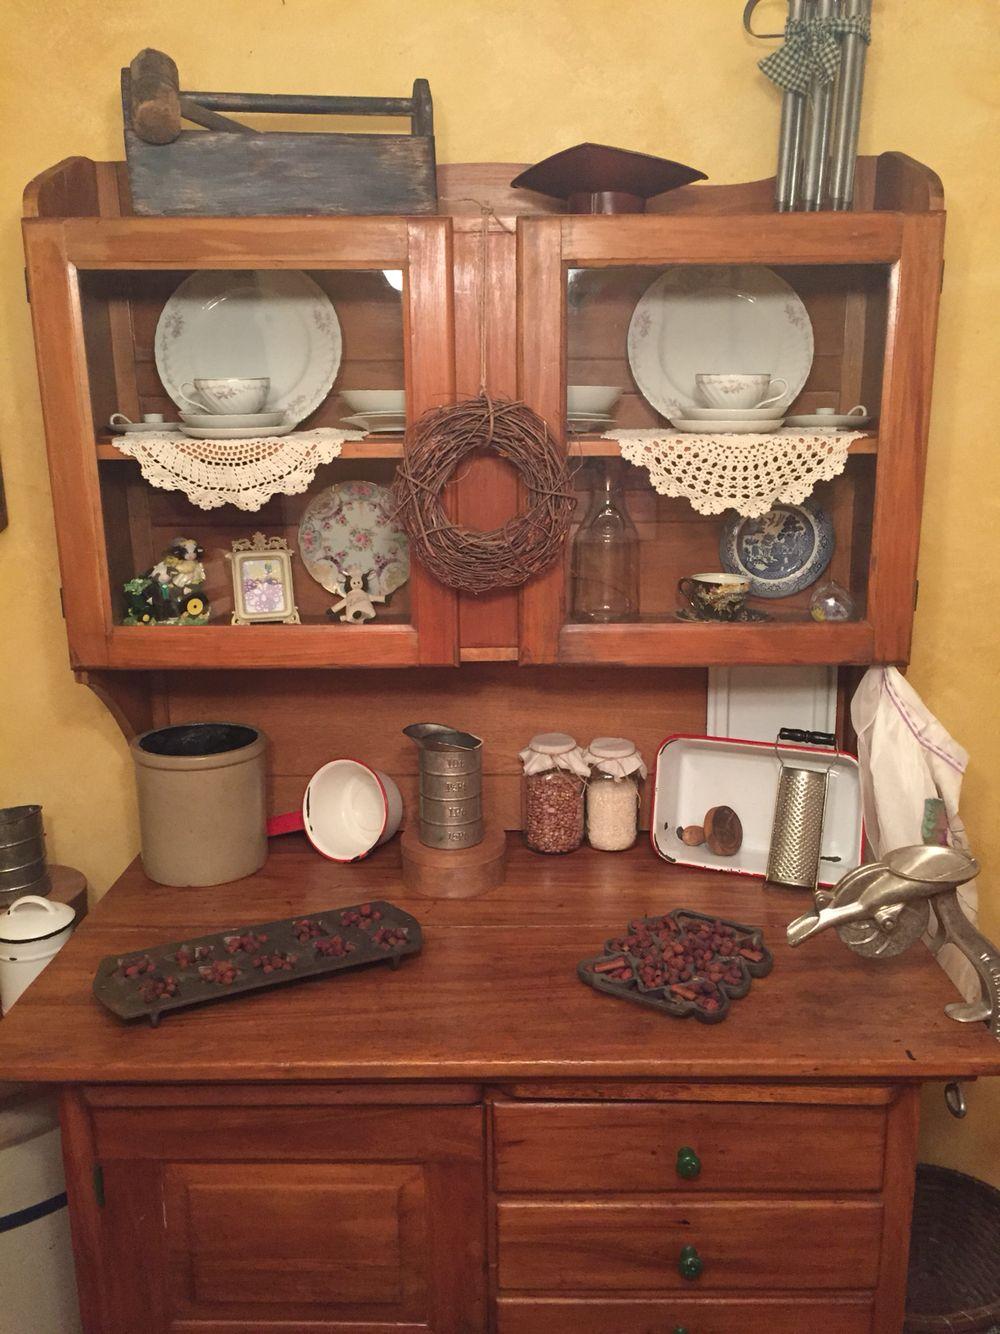 Antique baking cabinet! - Antique Baking Cabinet! Making A House, A Home! Pinterest House